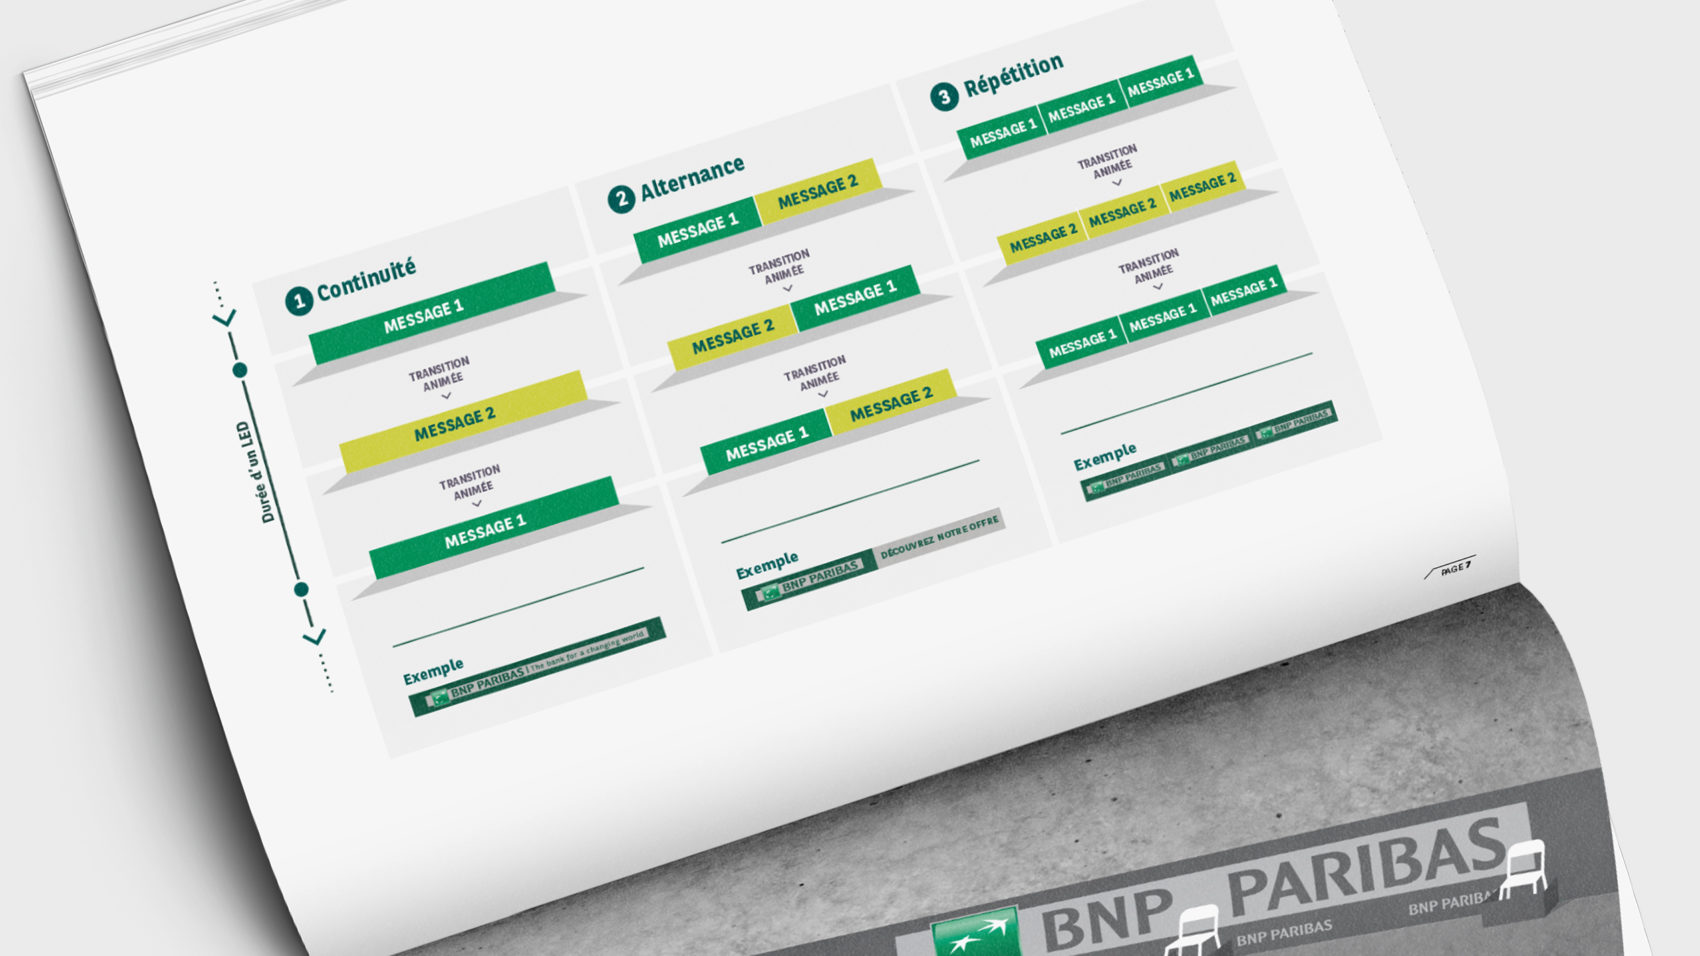 Projet_project_realisation_BNP_PARIBAS_roland_garros_2